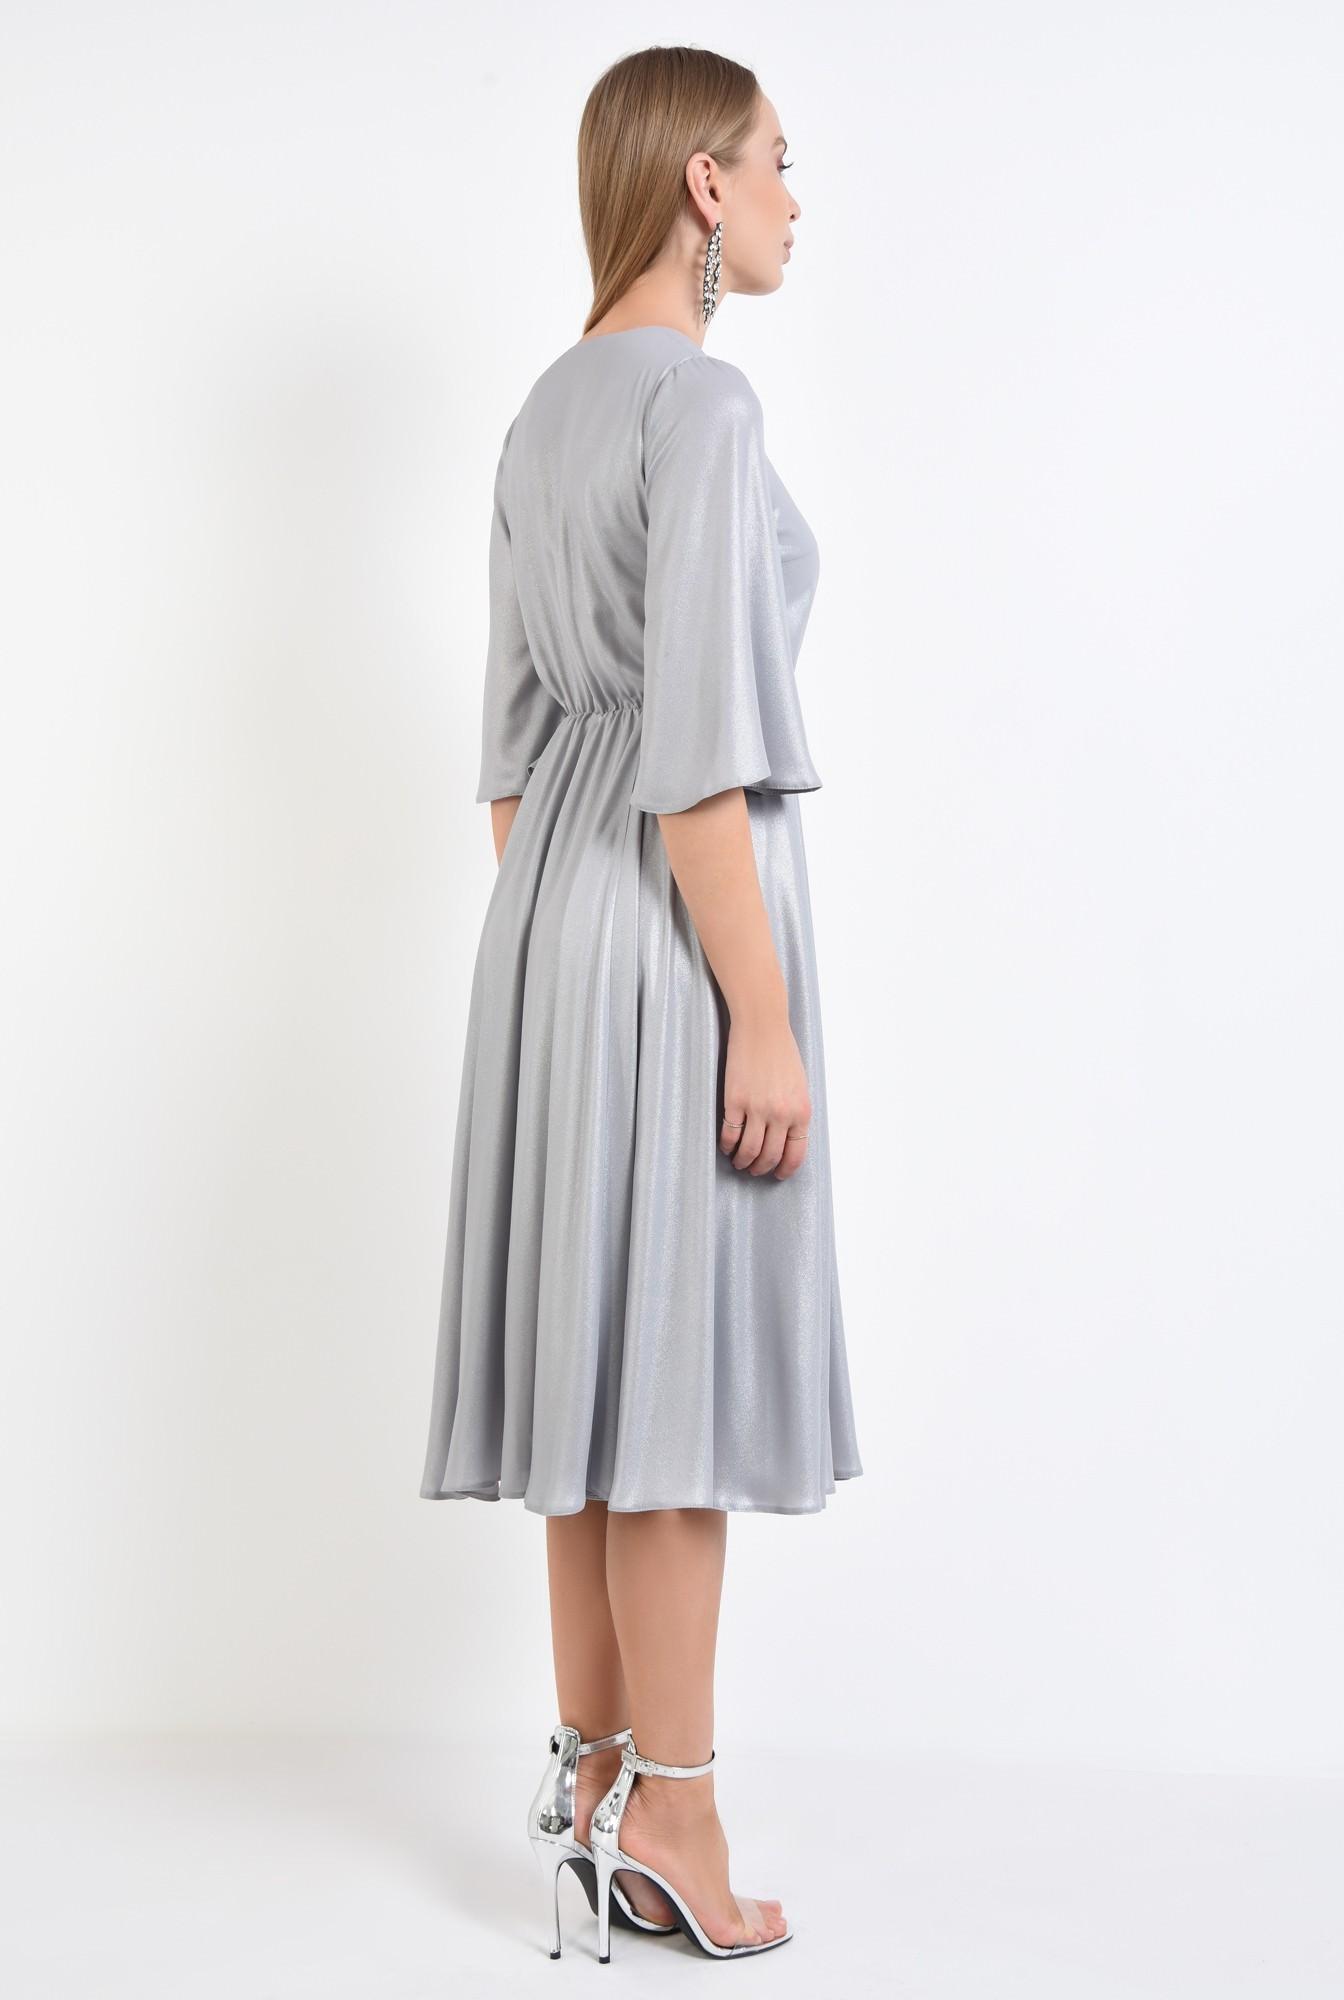 1 - rochie eleganta, clos, lurex, argintiu